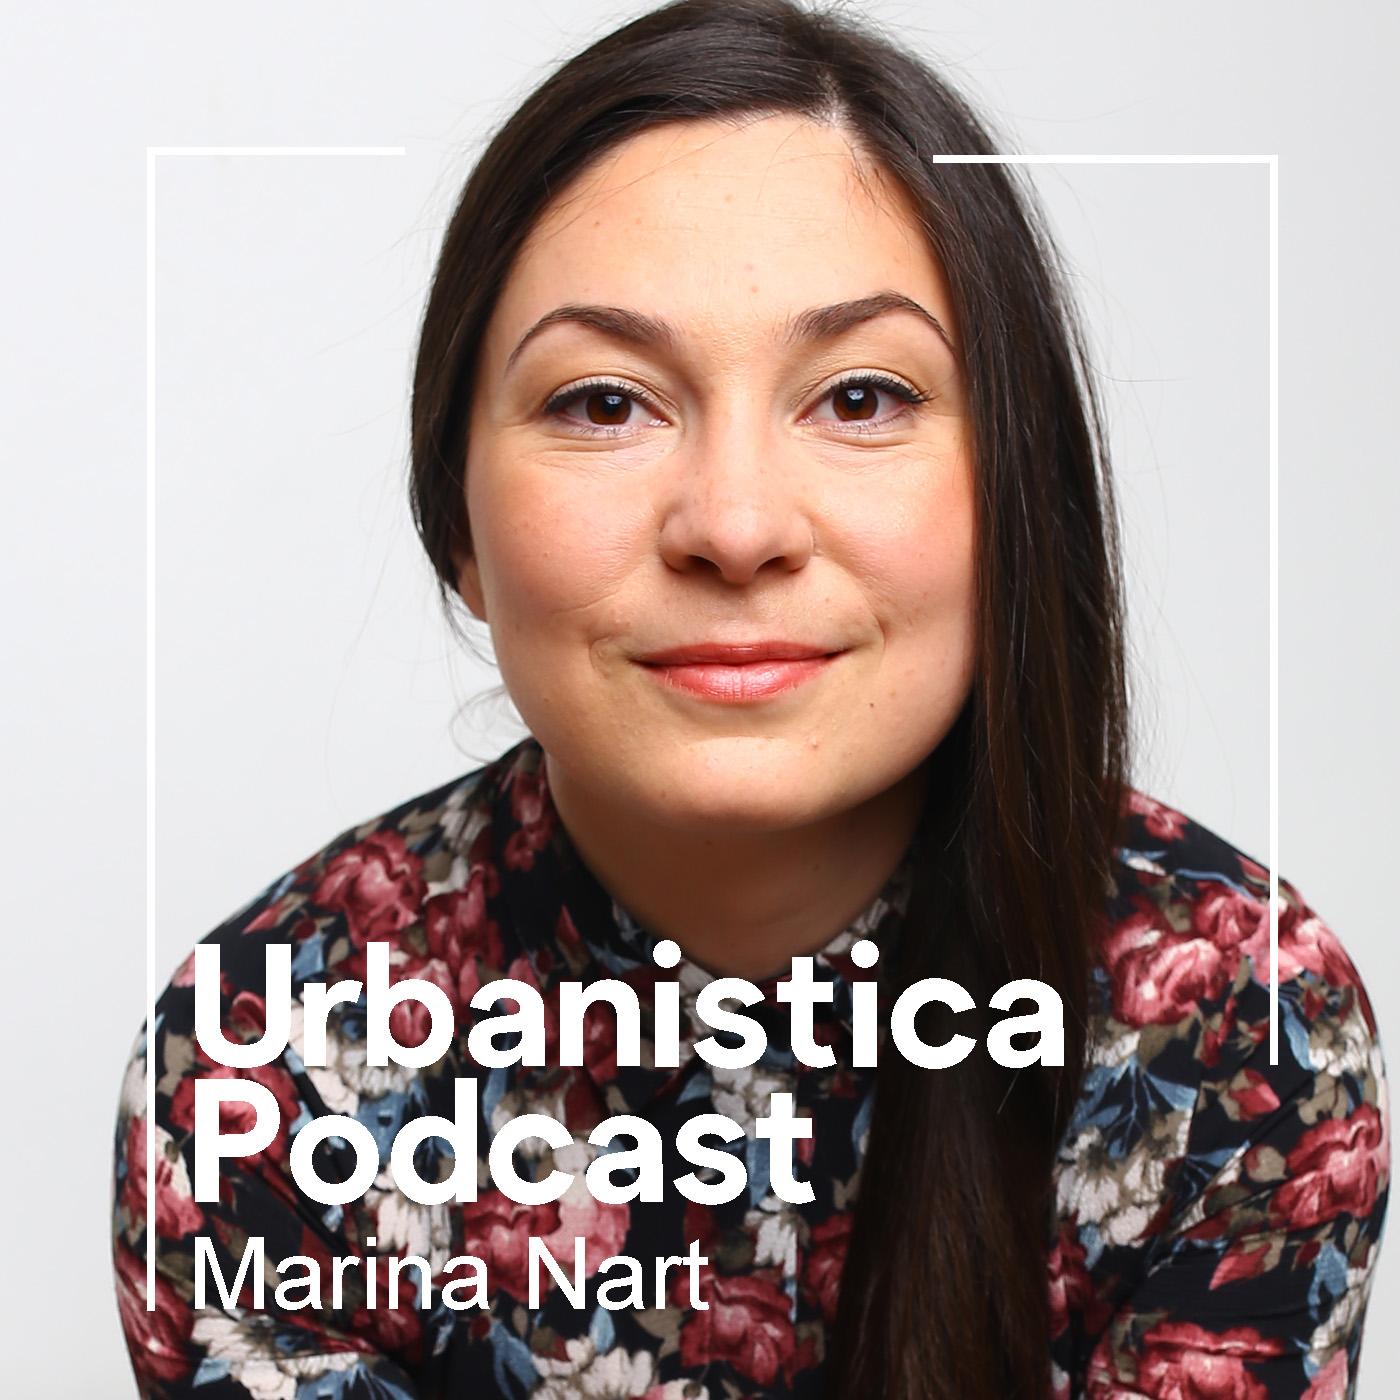 E23. EN. Beyond Agenda 2030 - Marina Nart